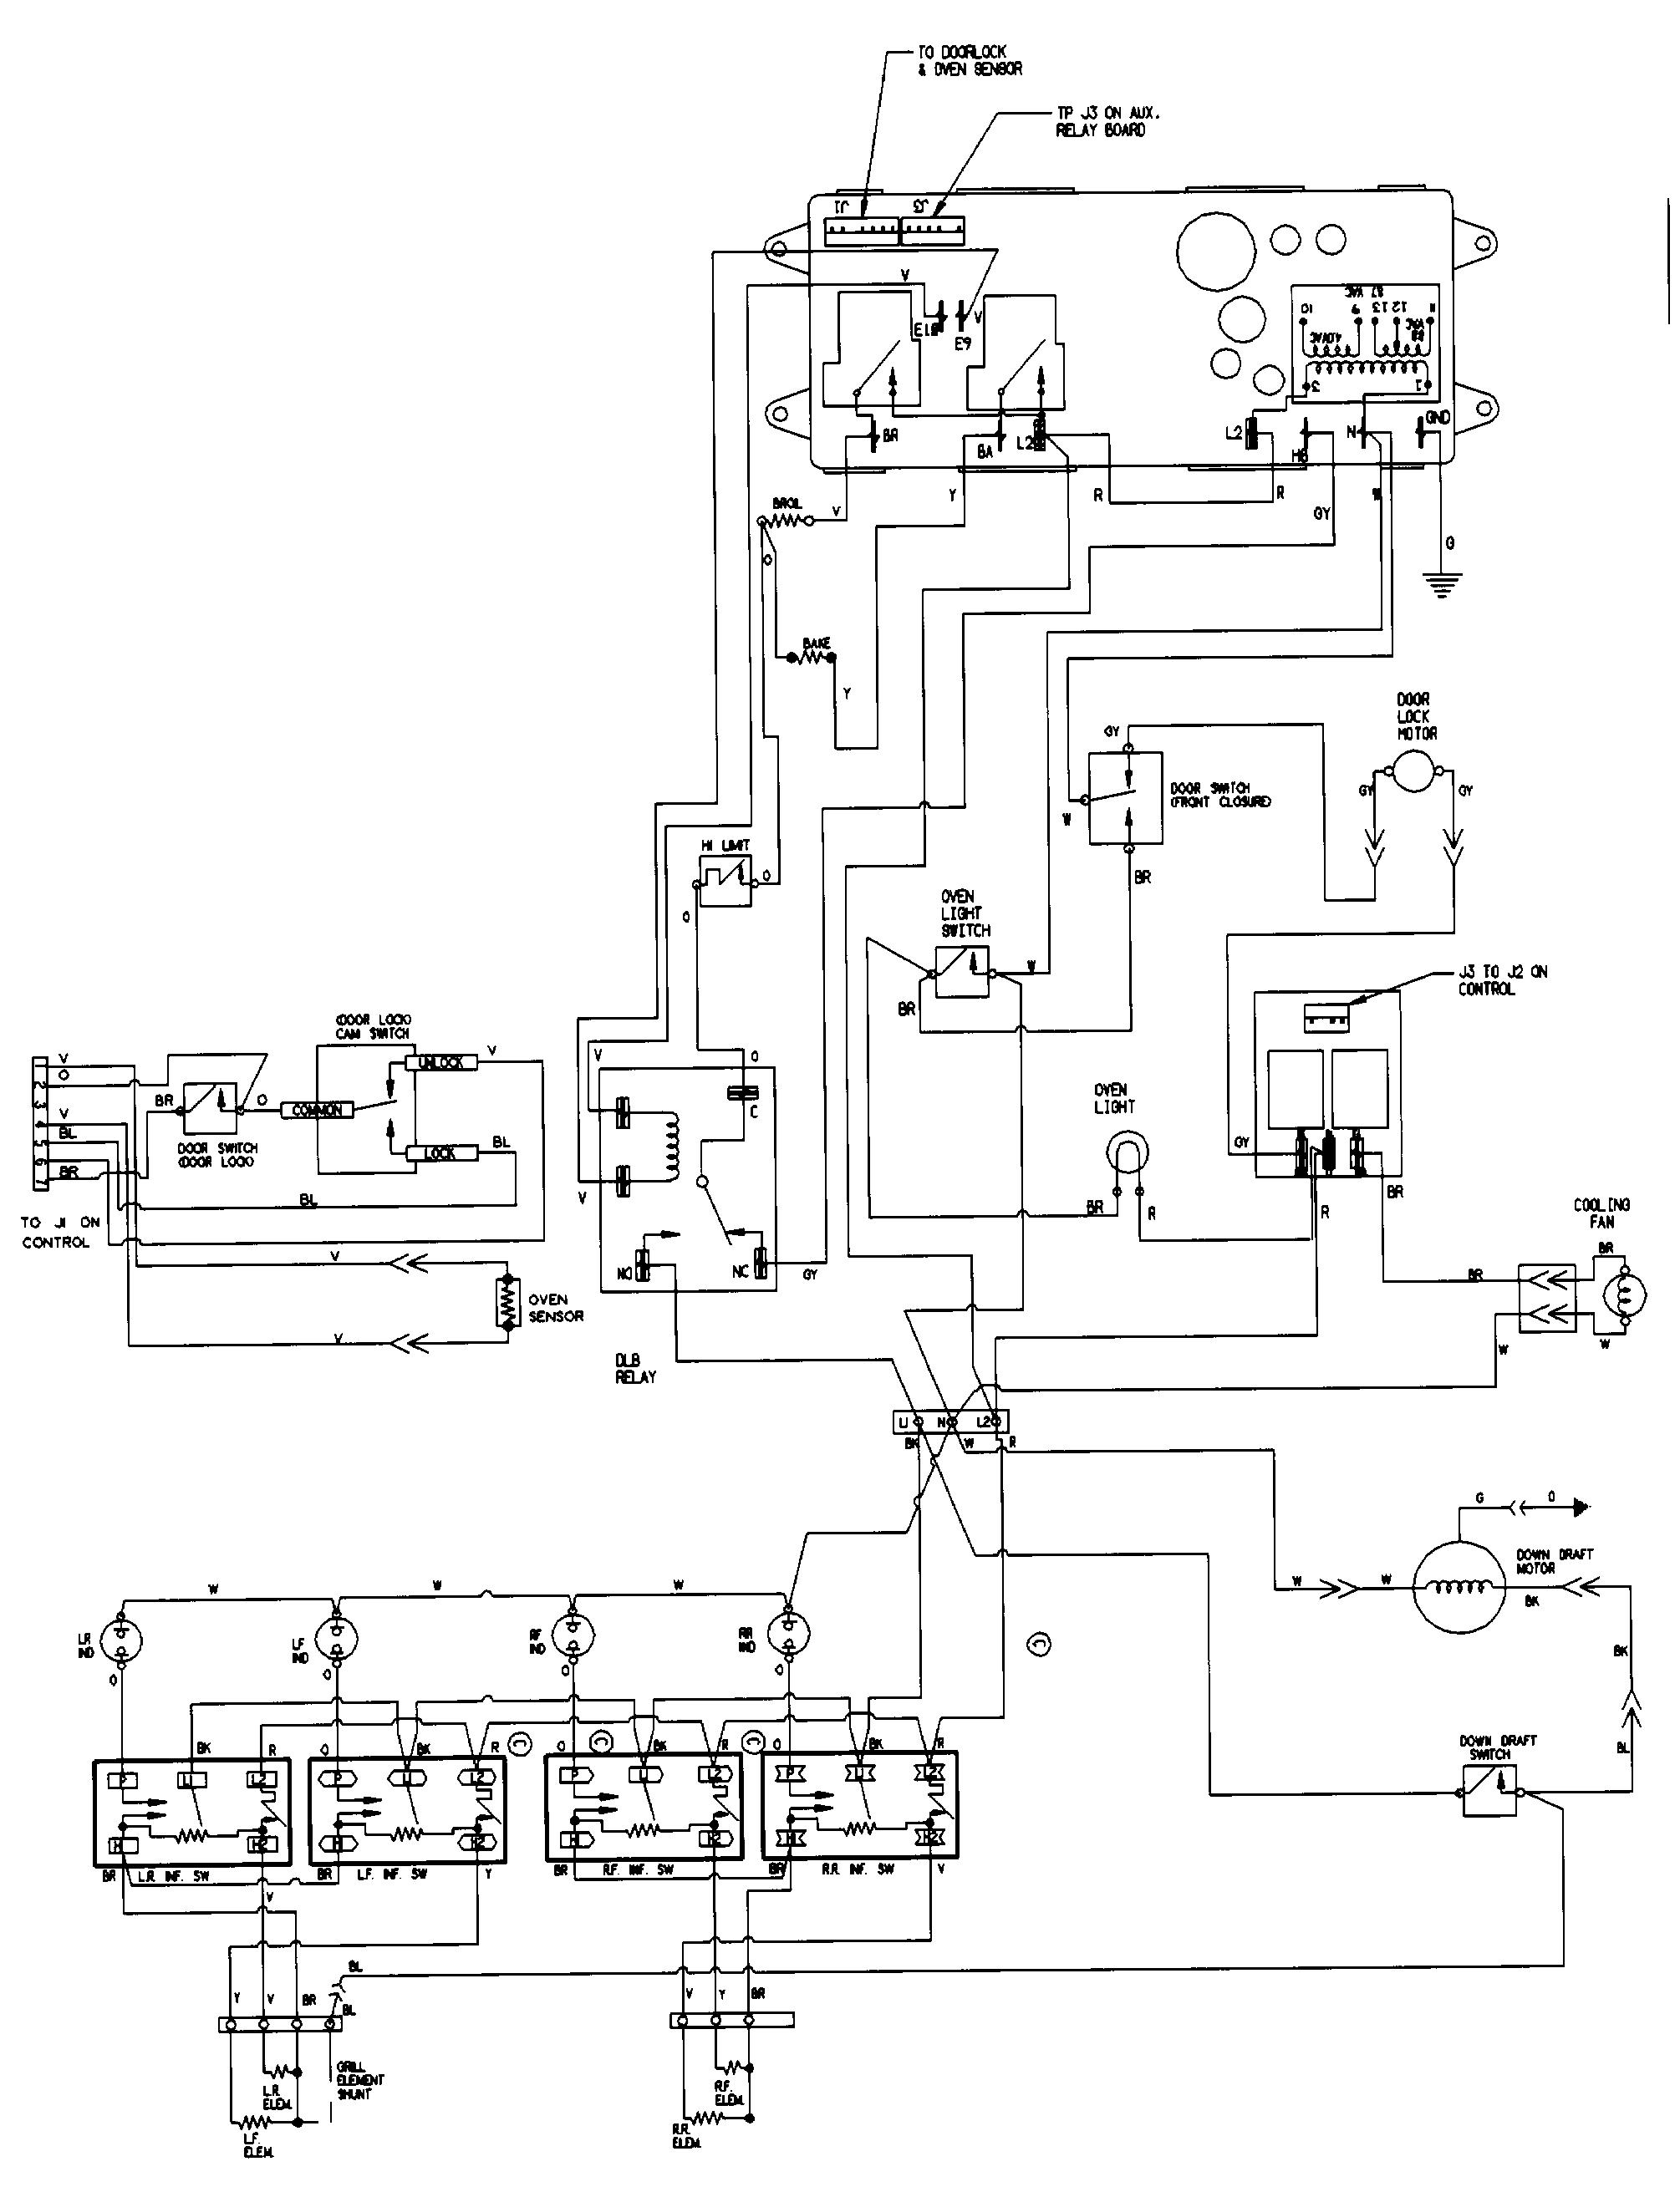 BF_9733] Jenn Air Electric Stove Wiring Diagram Free DiagramDness Xeira Mohammedshrine Librar Wiring 101